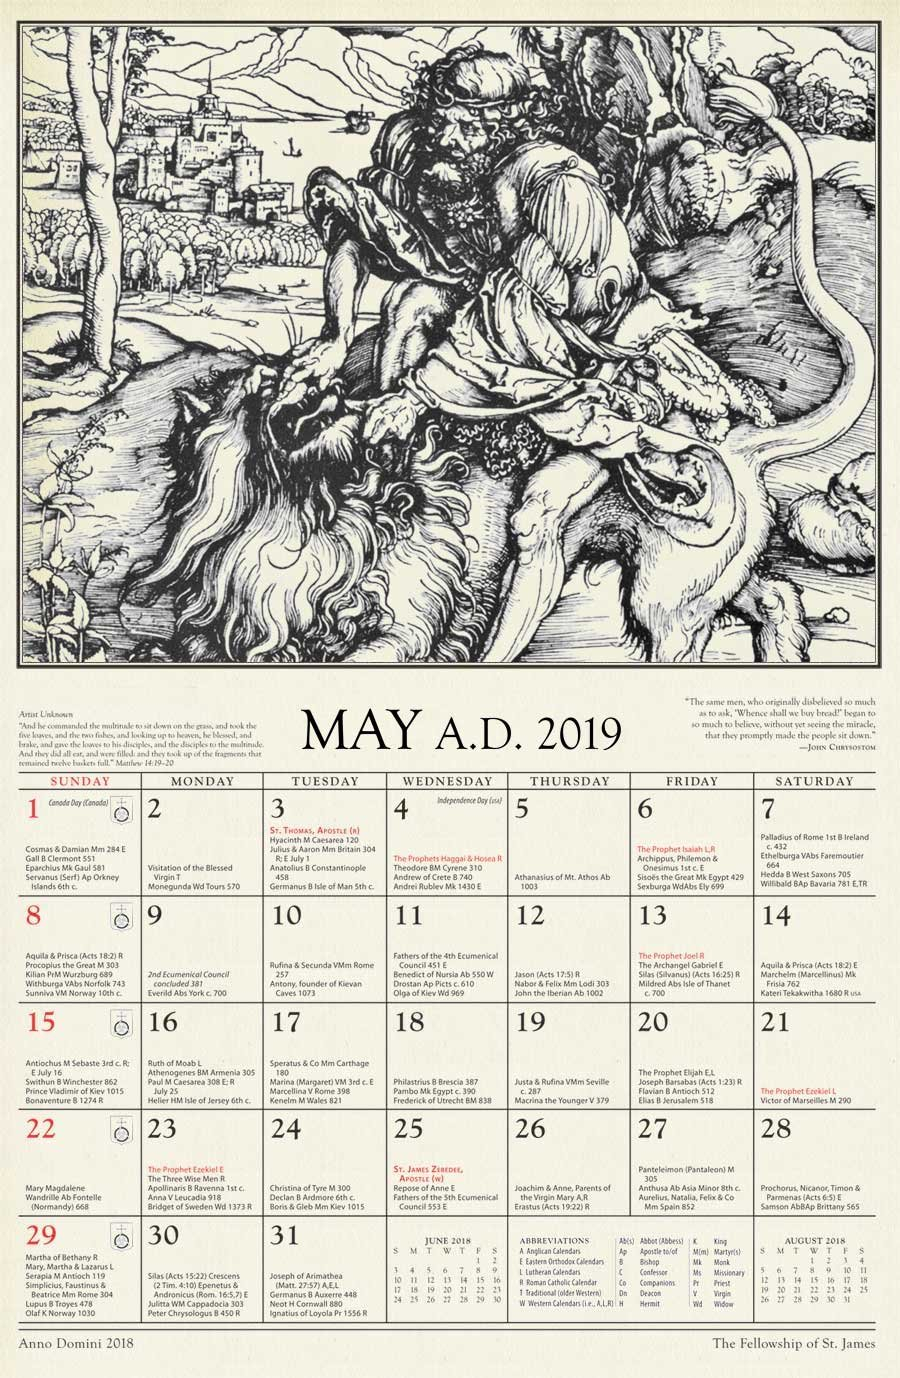 Anno Domini: The 2019 St. James Calendar Calendar X 2019